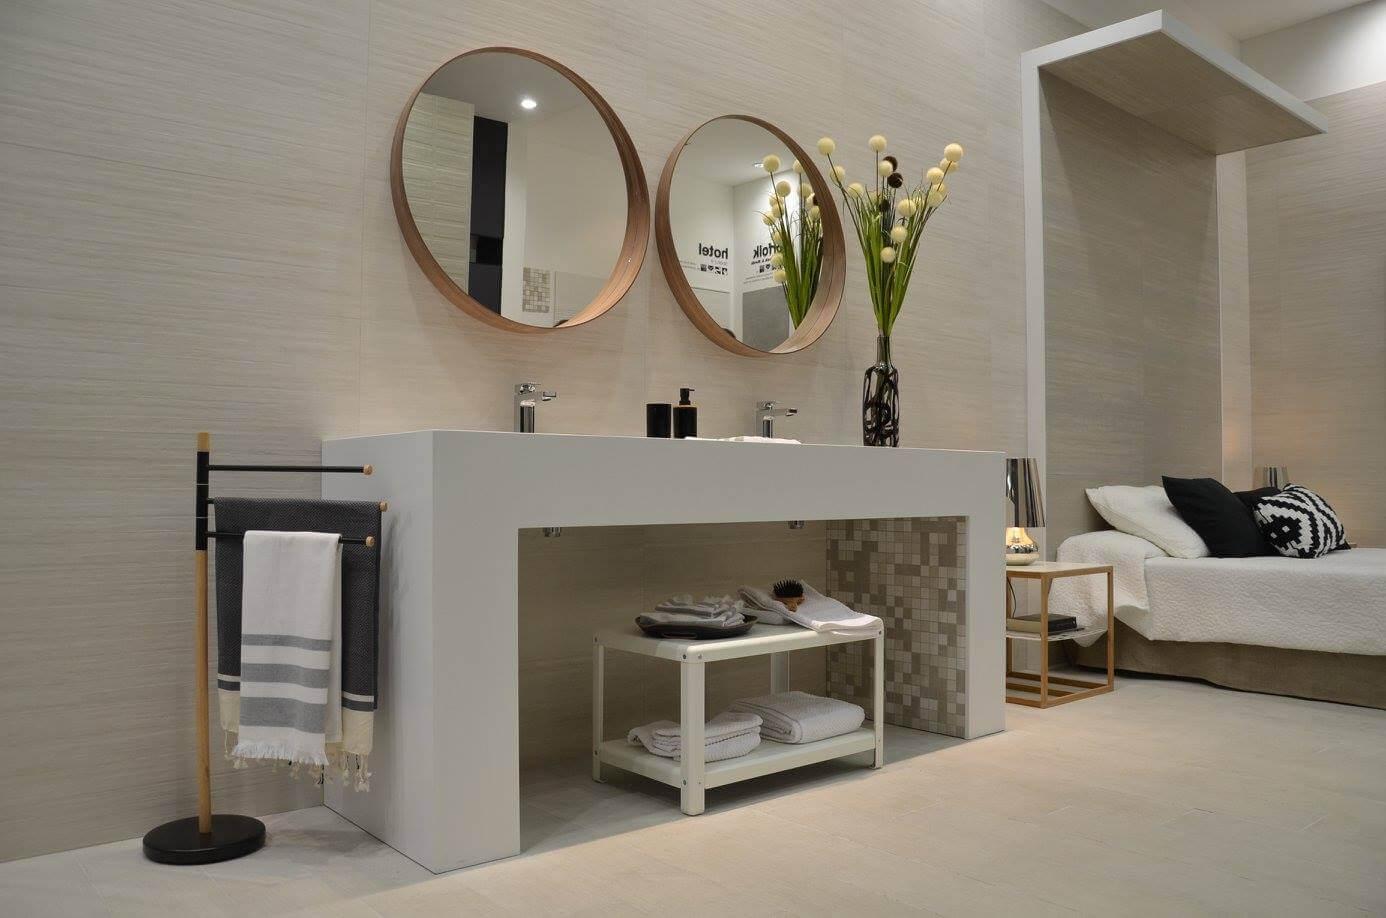 Badtrends 2017 vom designer torsten m ller aus bad honnef for Badezimmer design 2017